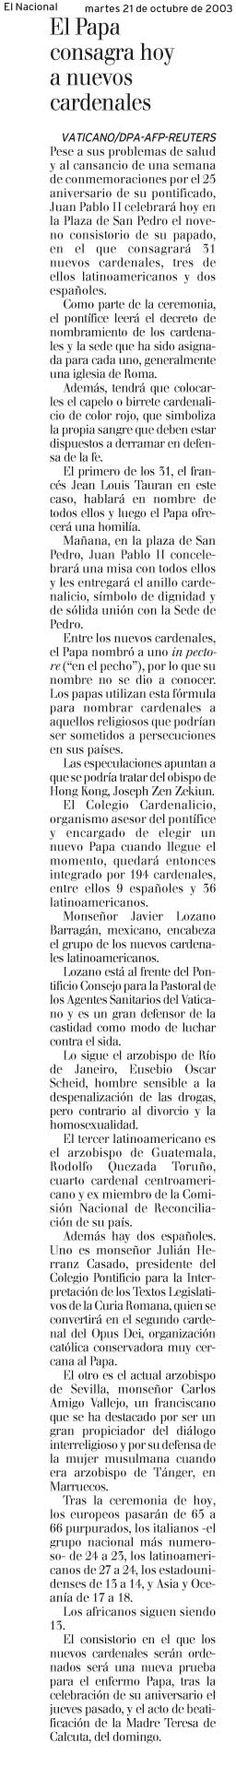 En el 2003 el papa Juan Pablo II beatificó a la Madre Teresa de Calcuta.  Publicado el 21 de octubre de 2003